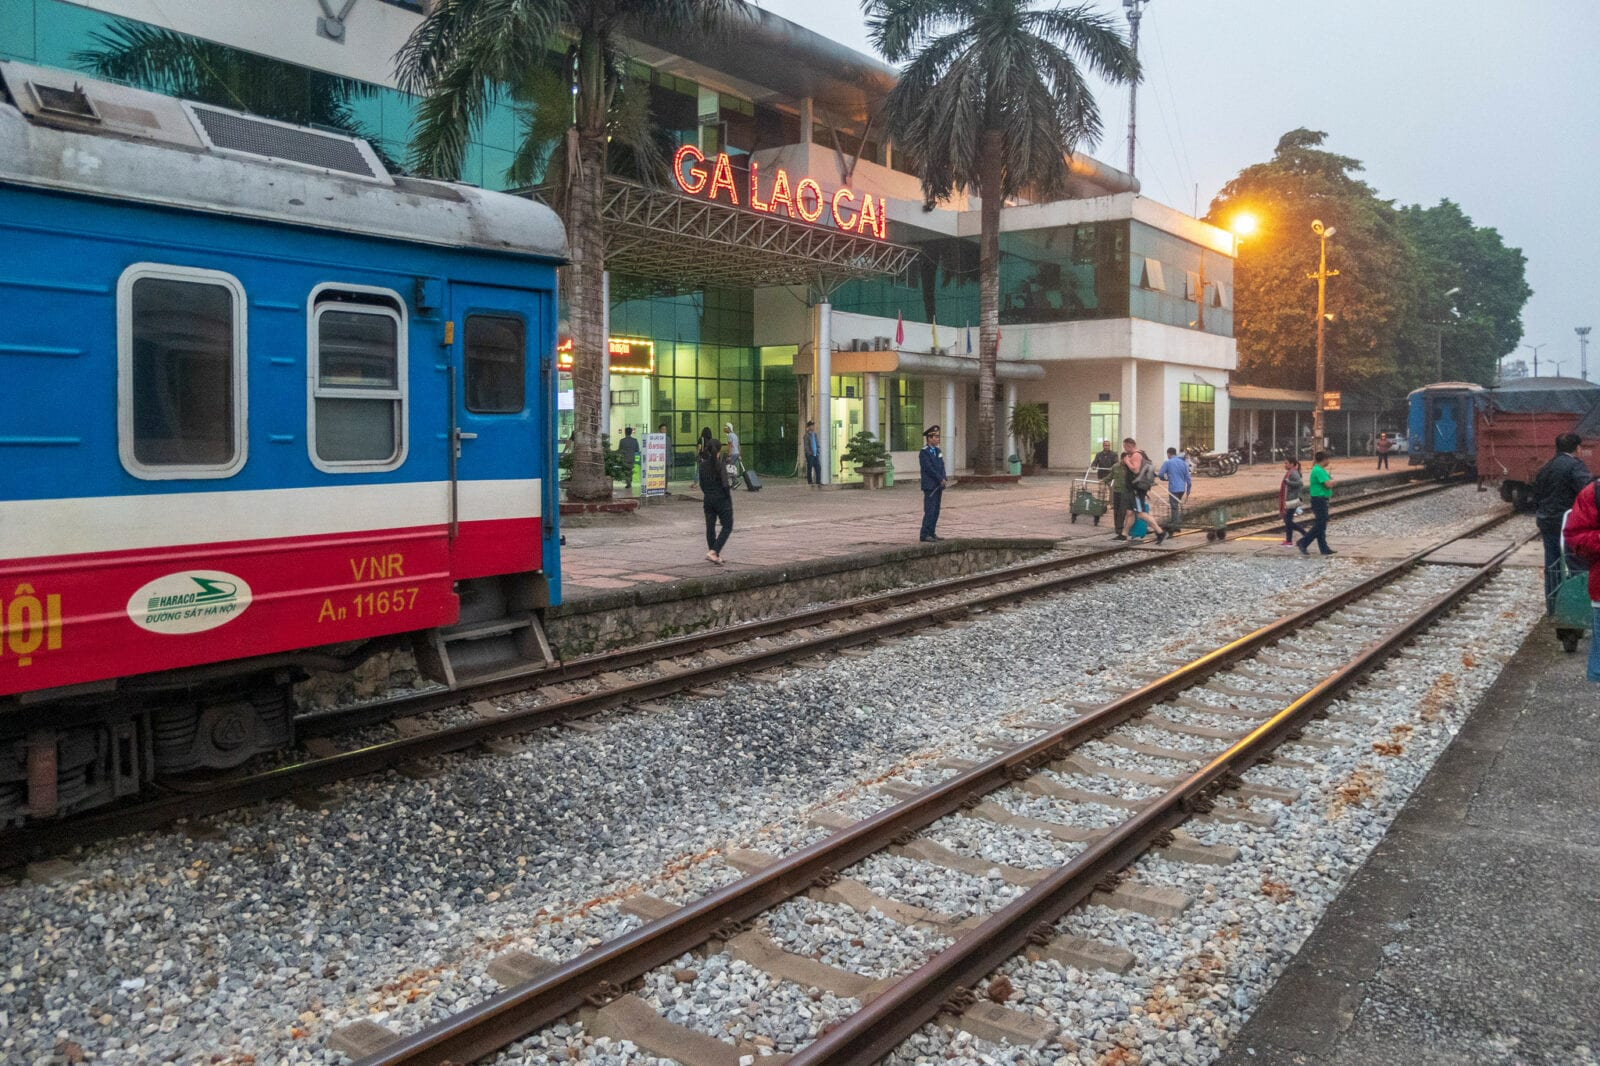 Image of a train in Lao Cai, Vietnam